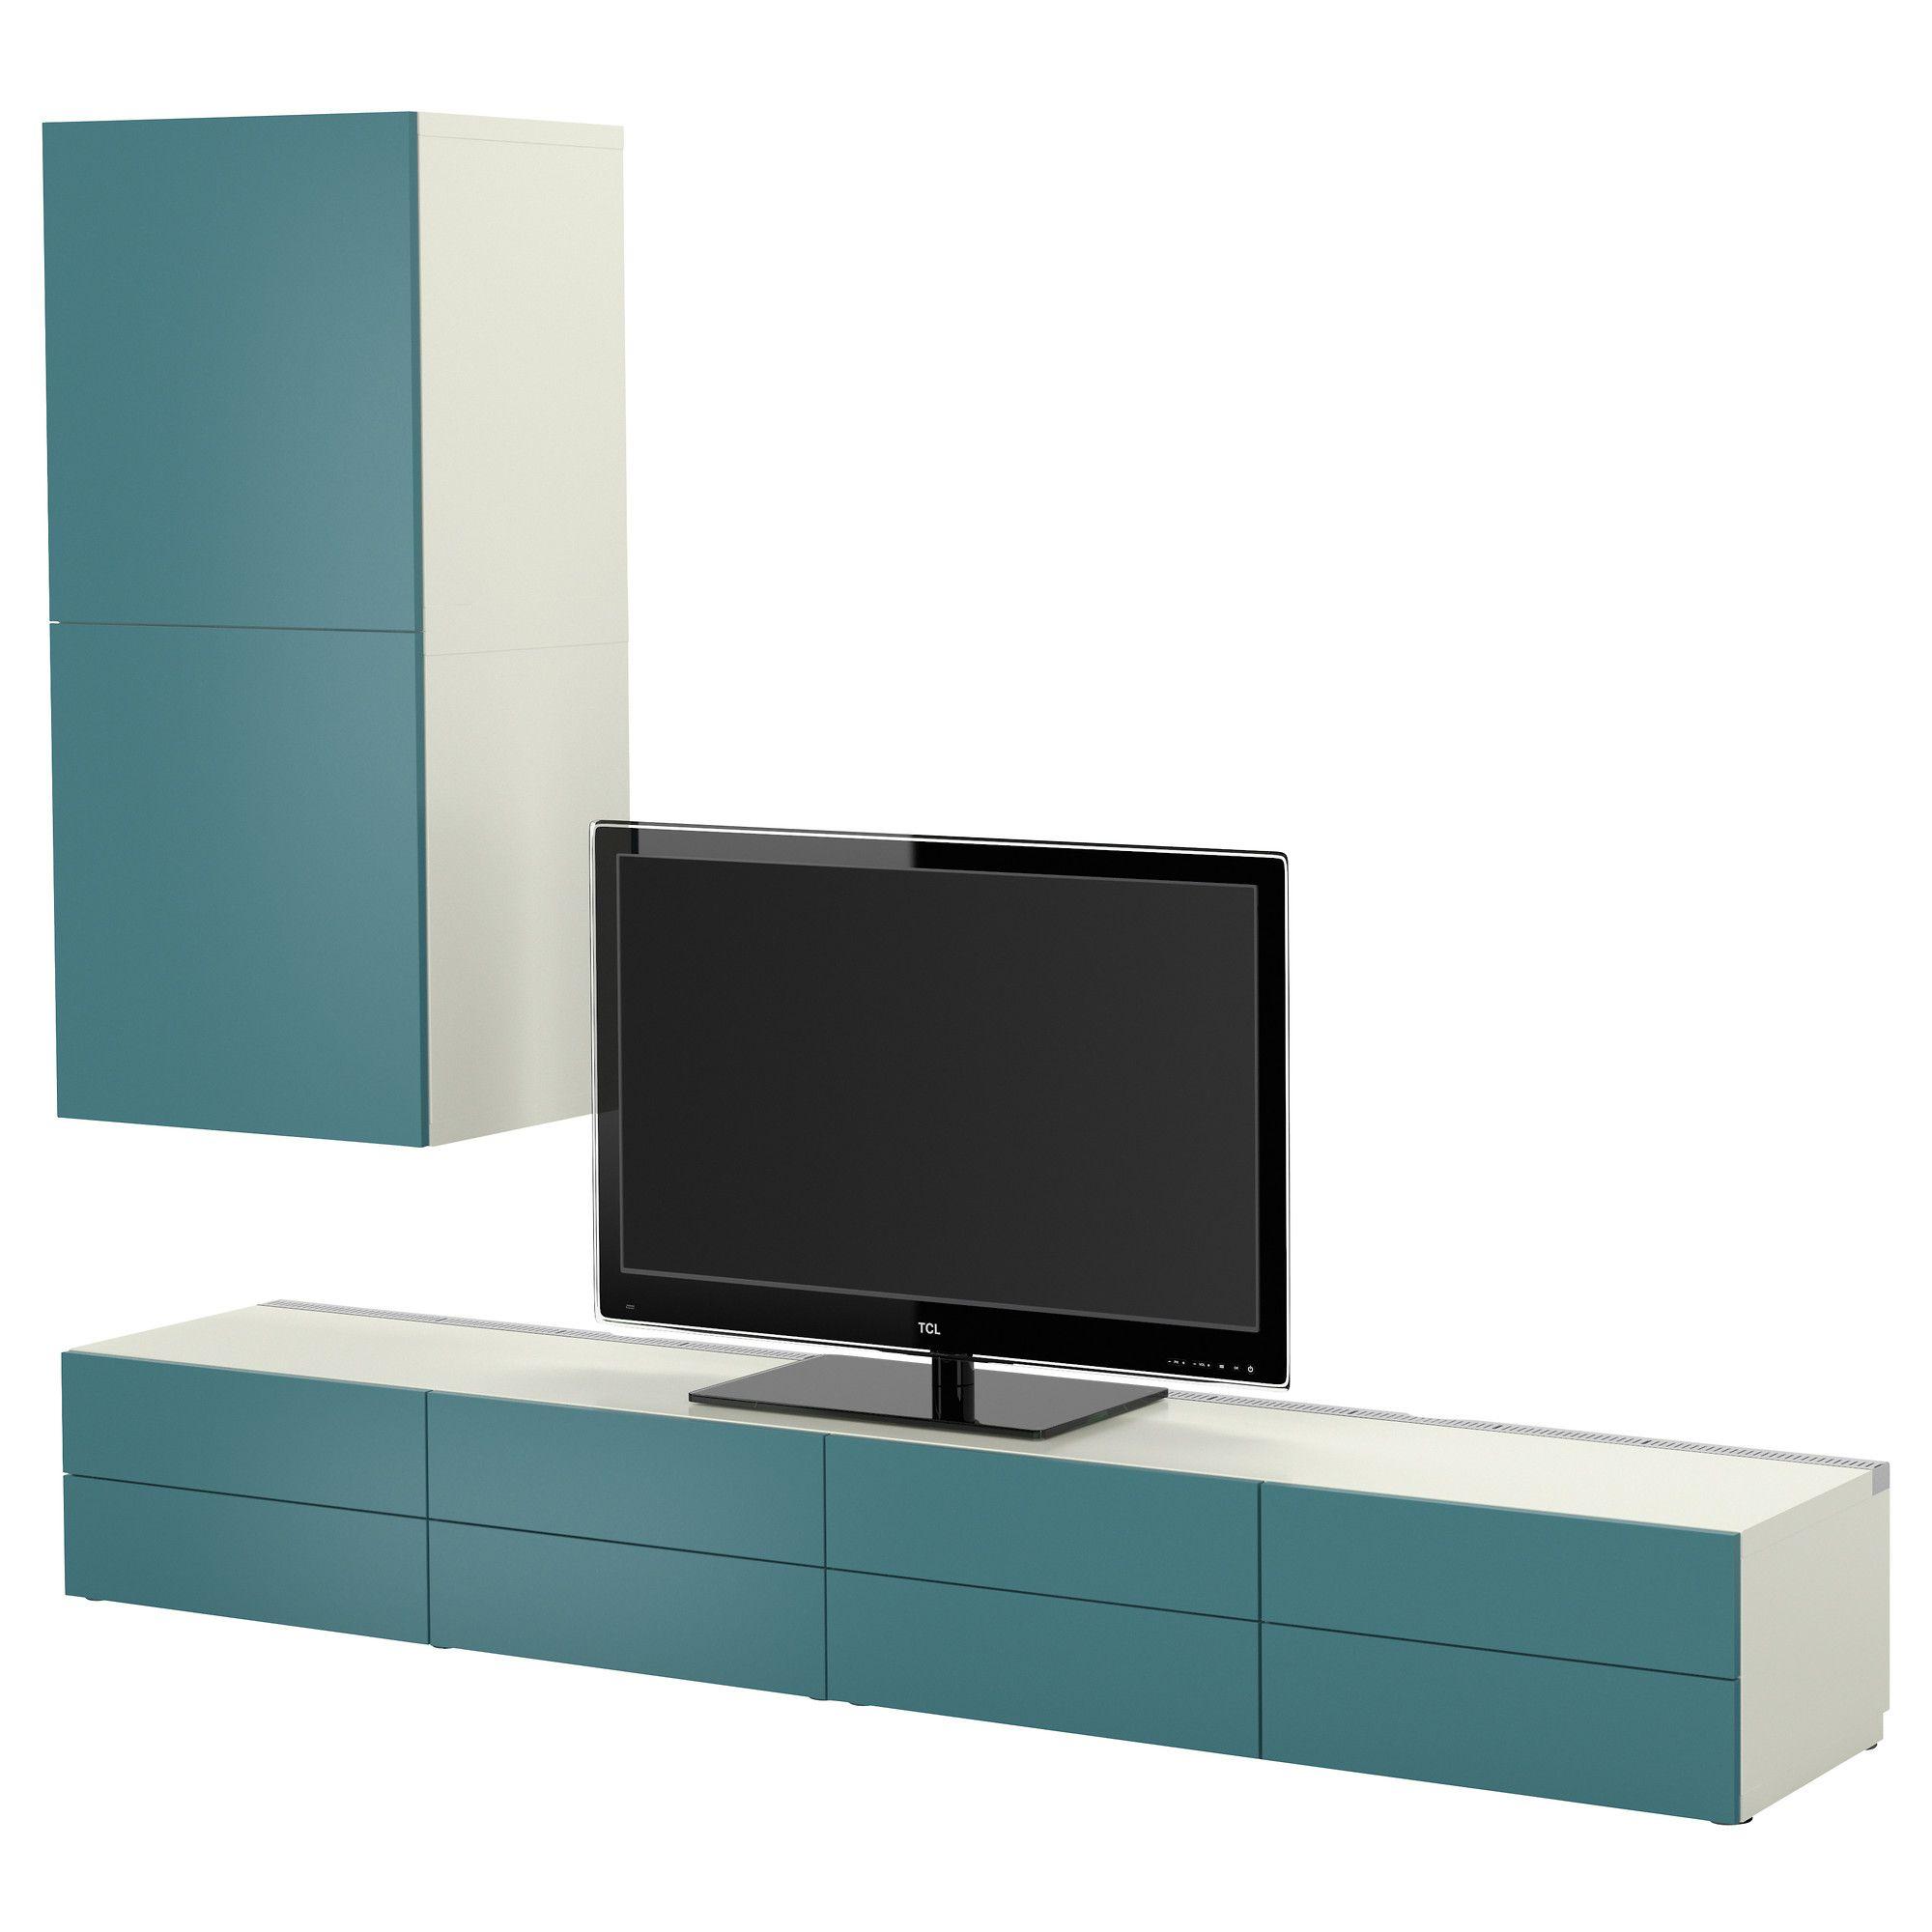 Wandmeubel Kallax Ikea.Besta Burs Tv Meubel Van Ikea Living Room Year Of Clean Water